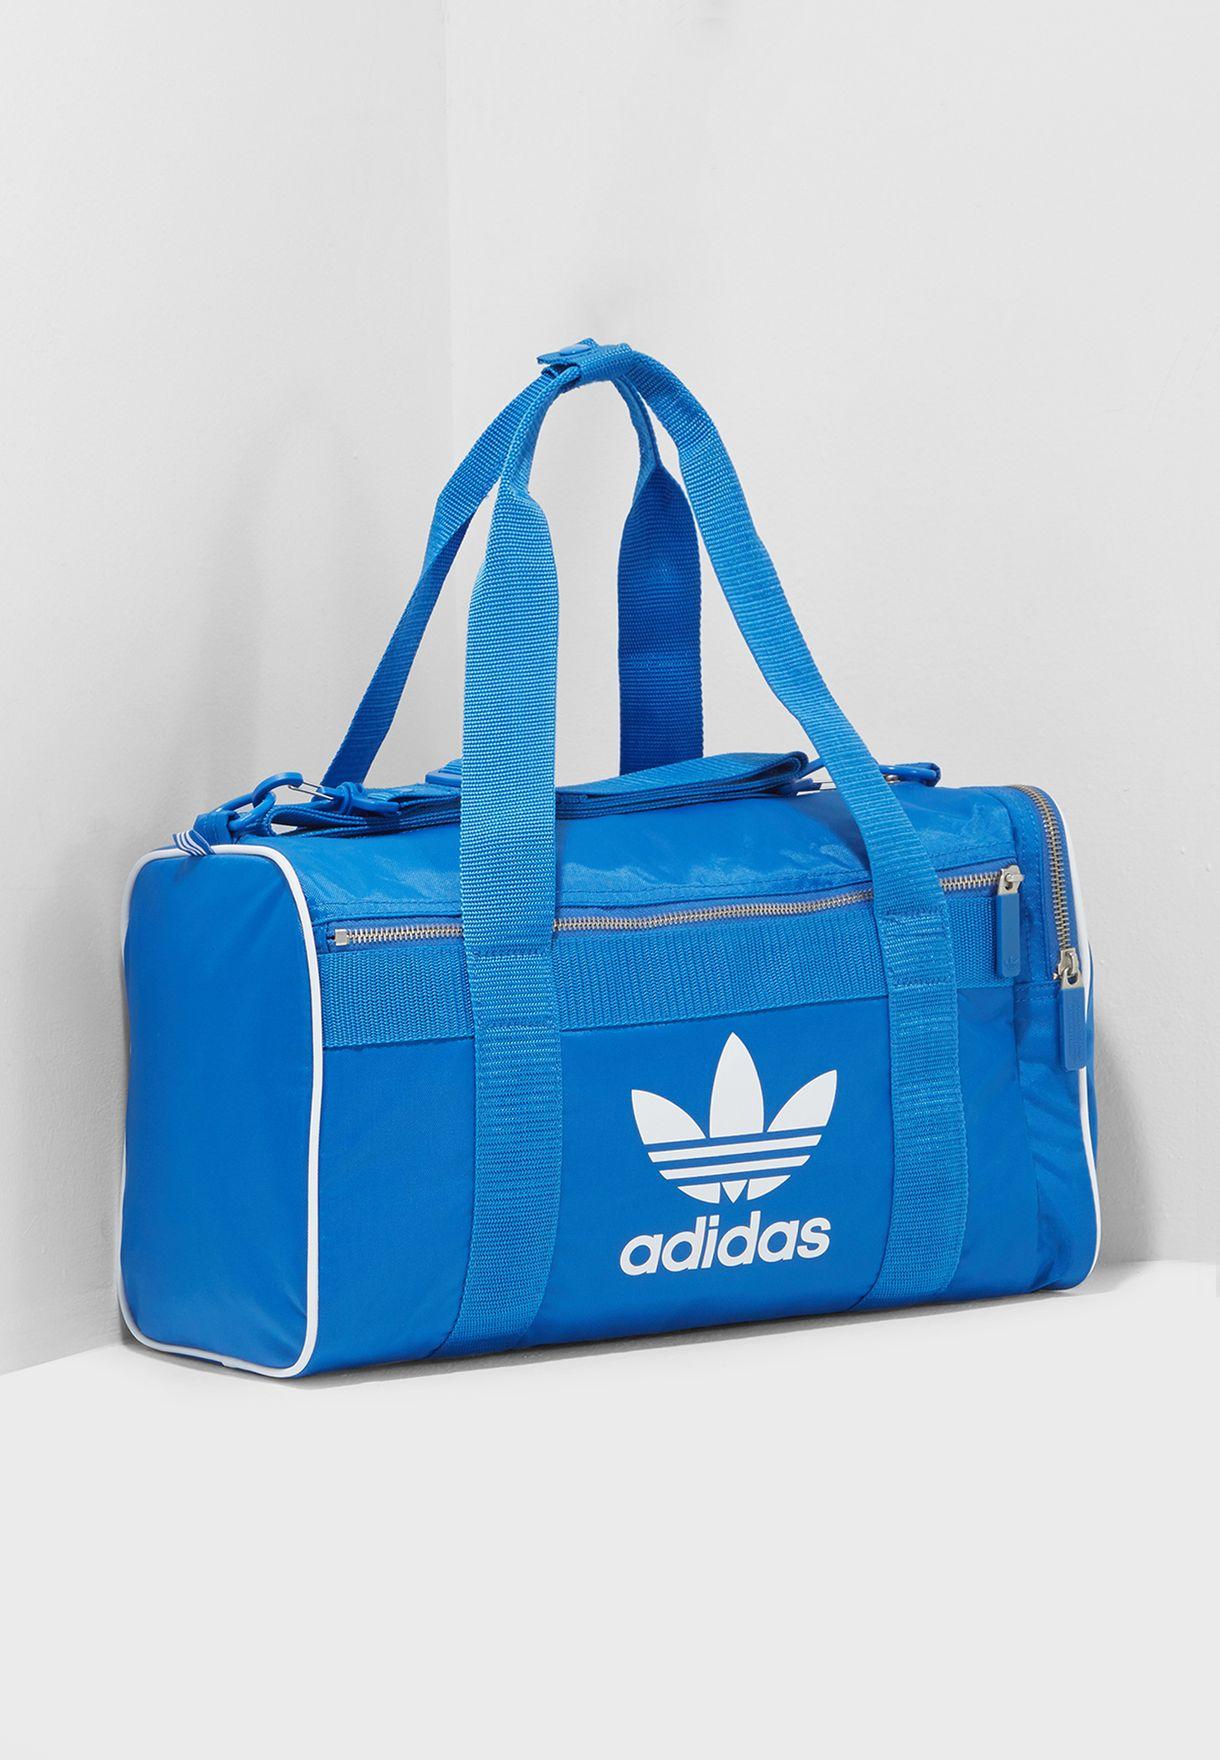 943f4b7585 Shop adidas Originals blue Medium Adicolor Duffel DH4322 for Men in ...